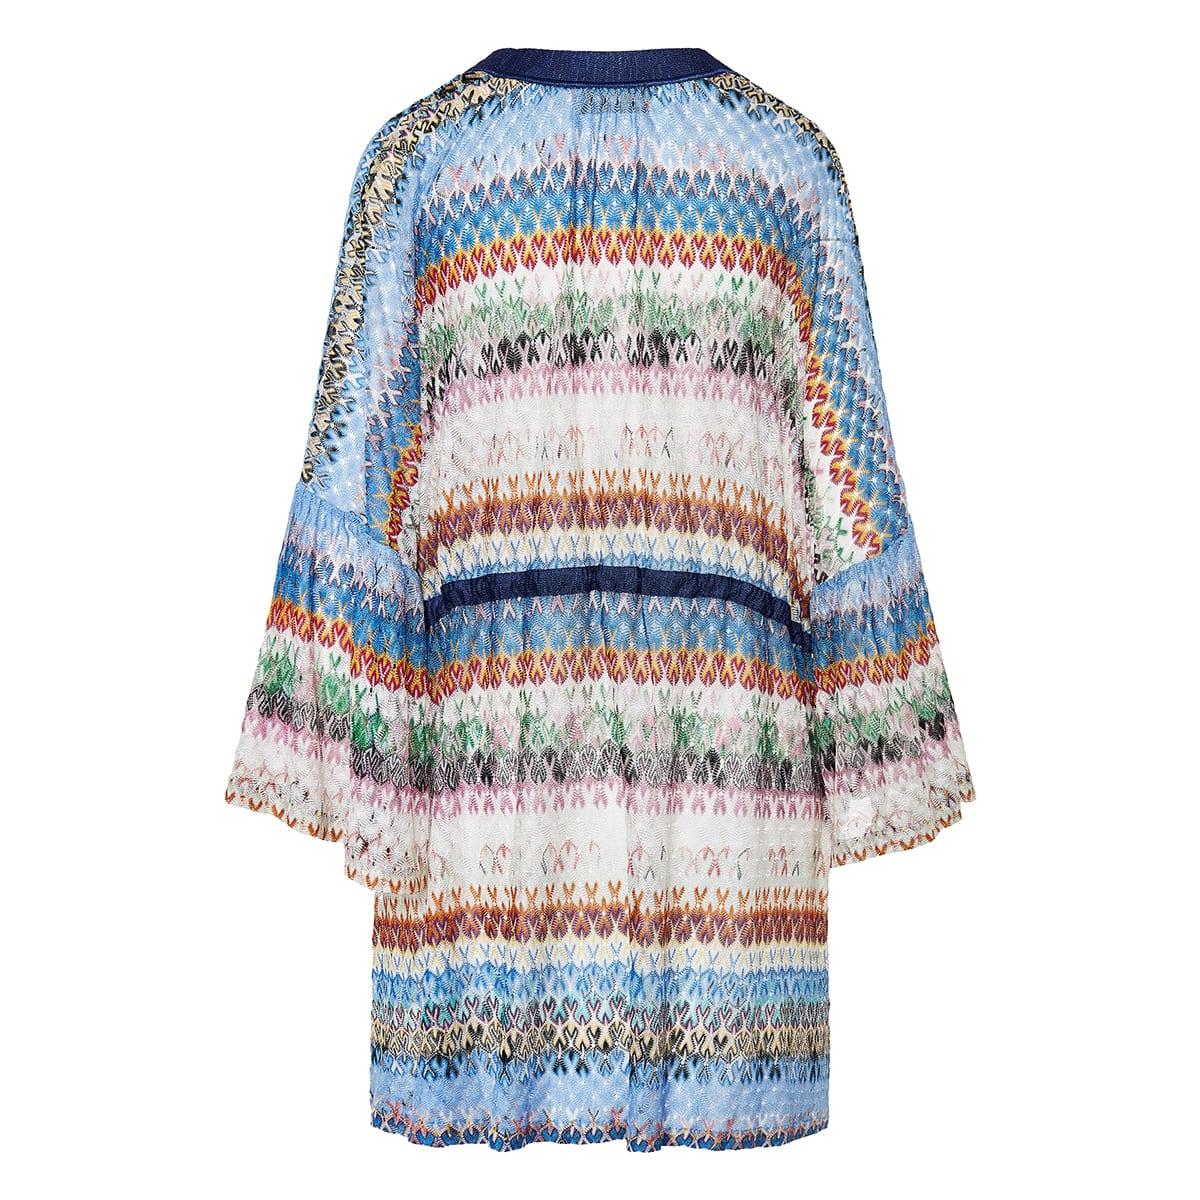 Patterned-knit kaftan dress